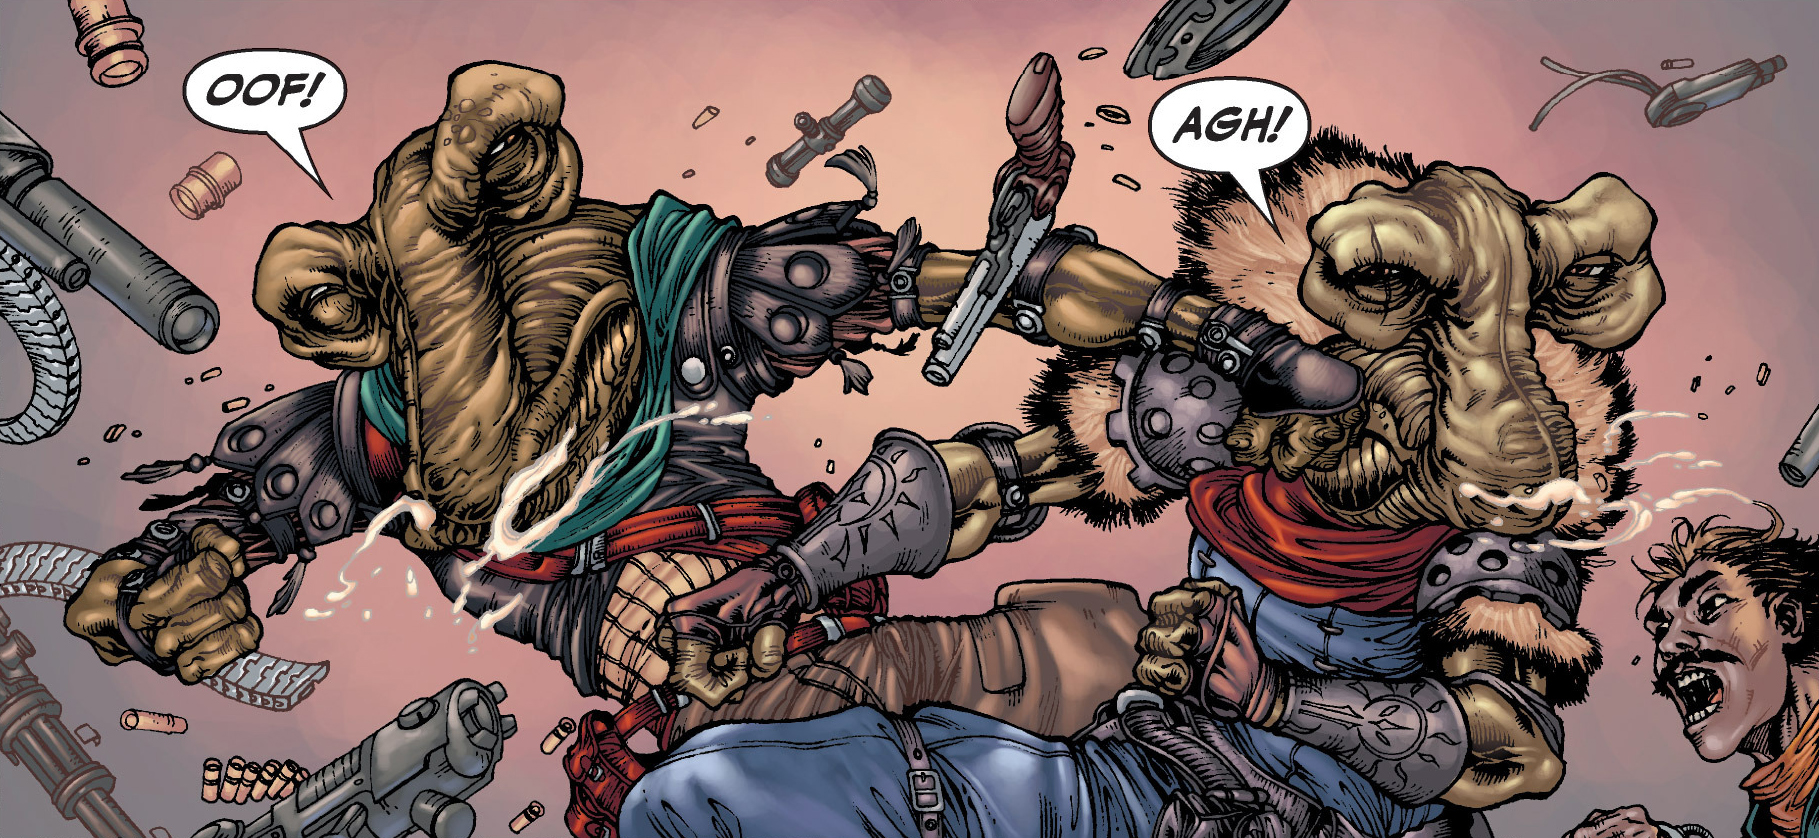 File:Moomo fight.jpg